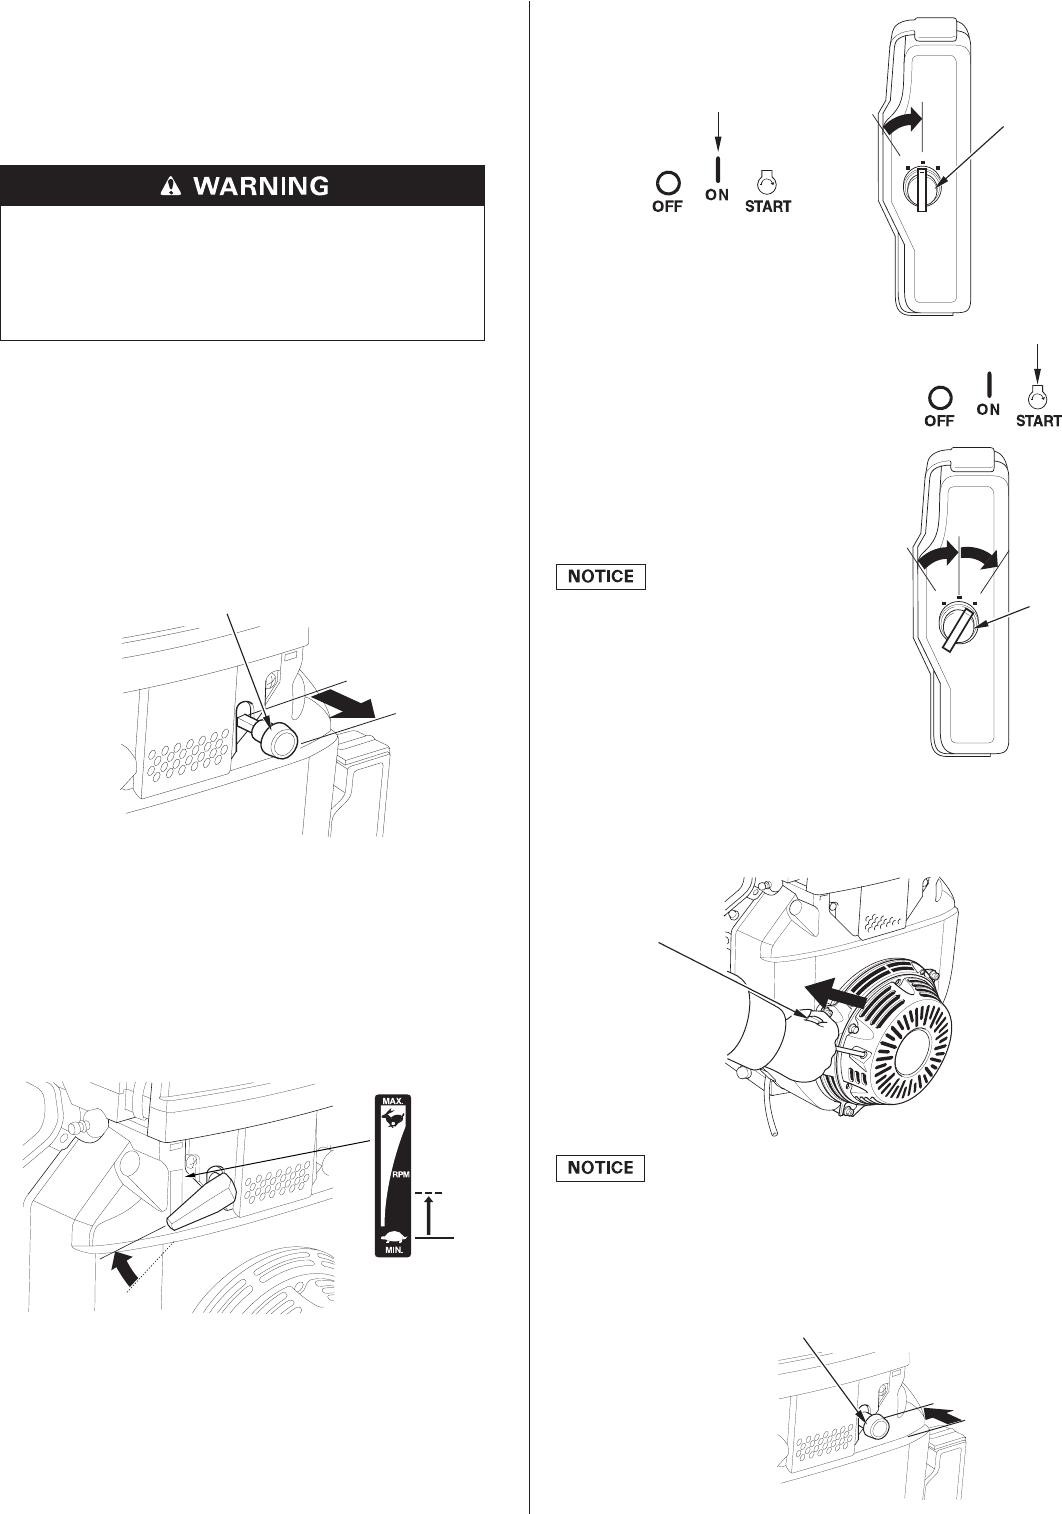 Handleiding Honda Honda Engines GX670 (pagina 16 van 58) (English) on